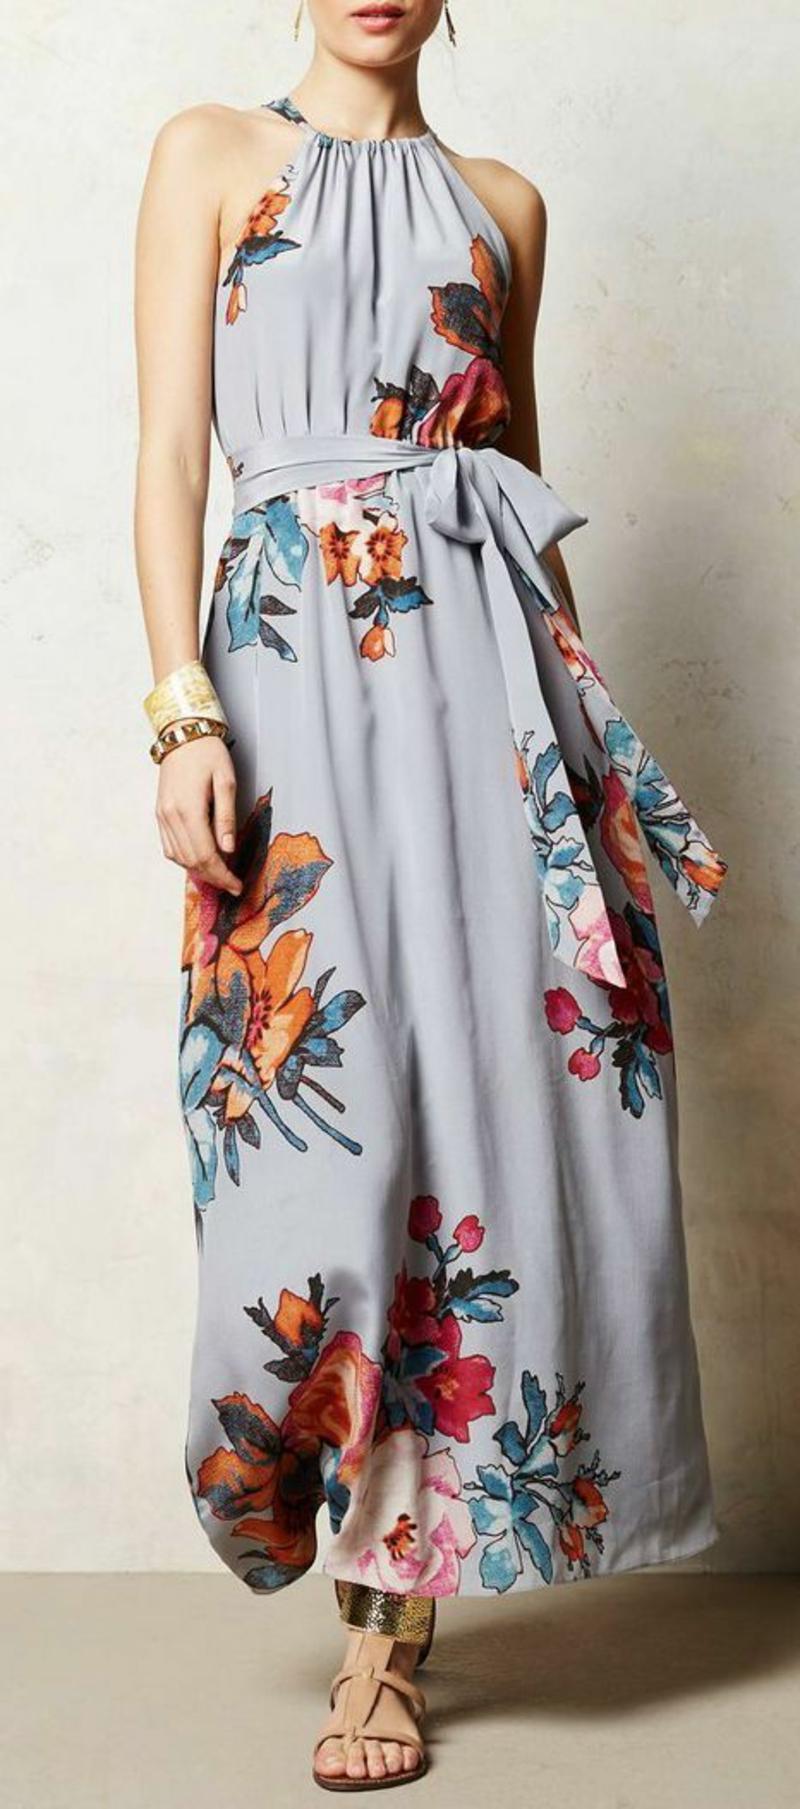 lange Sommerkleider Blumenkleid grau bunter Blumenprint